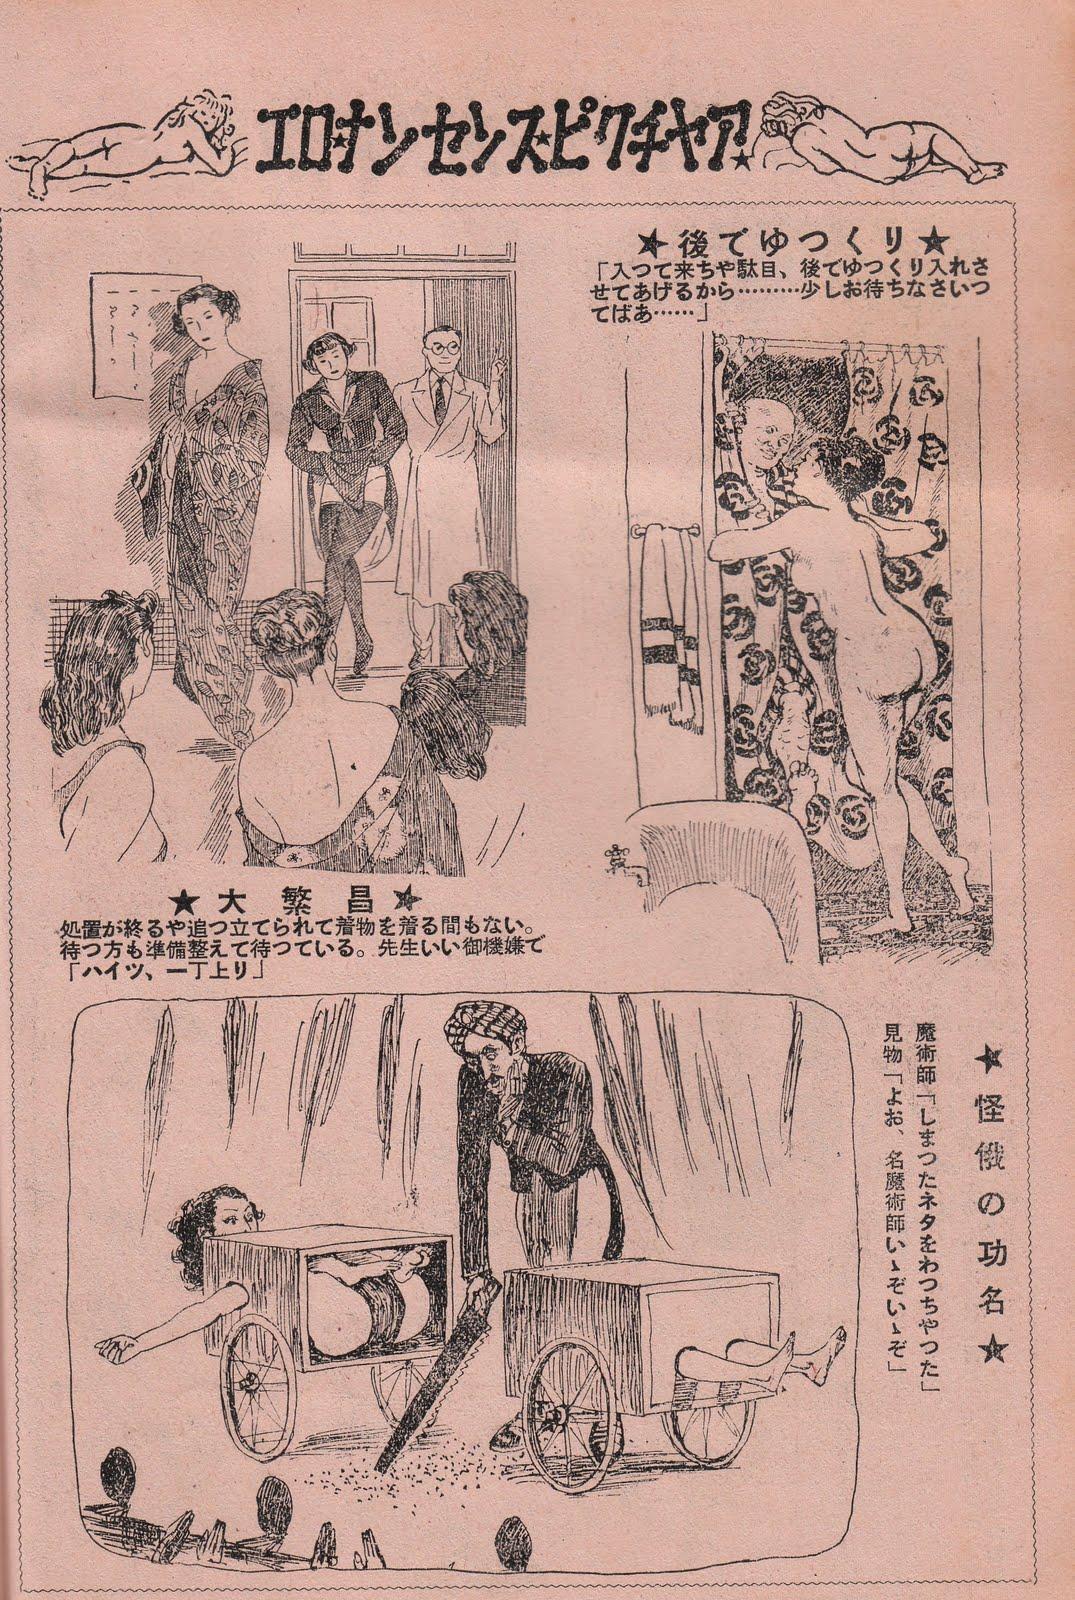 Japan Pulp Magazine Arabian Night by Togenshiya